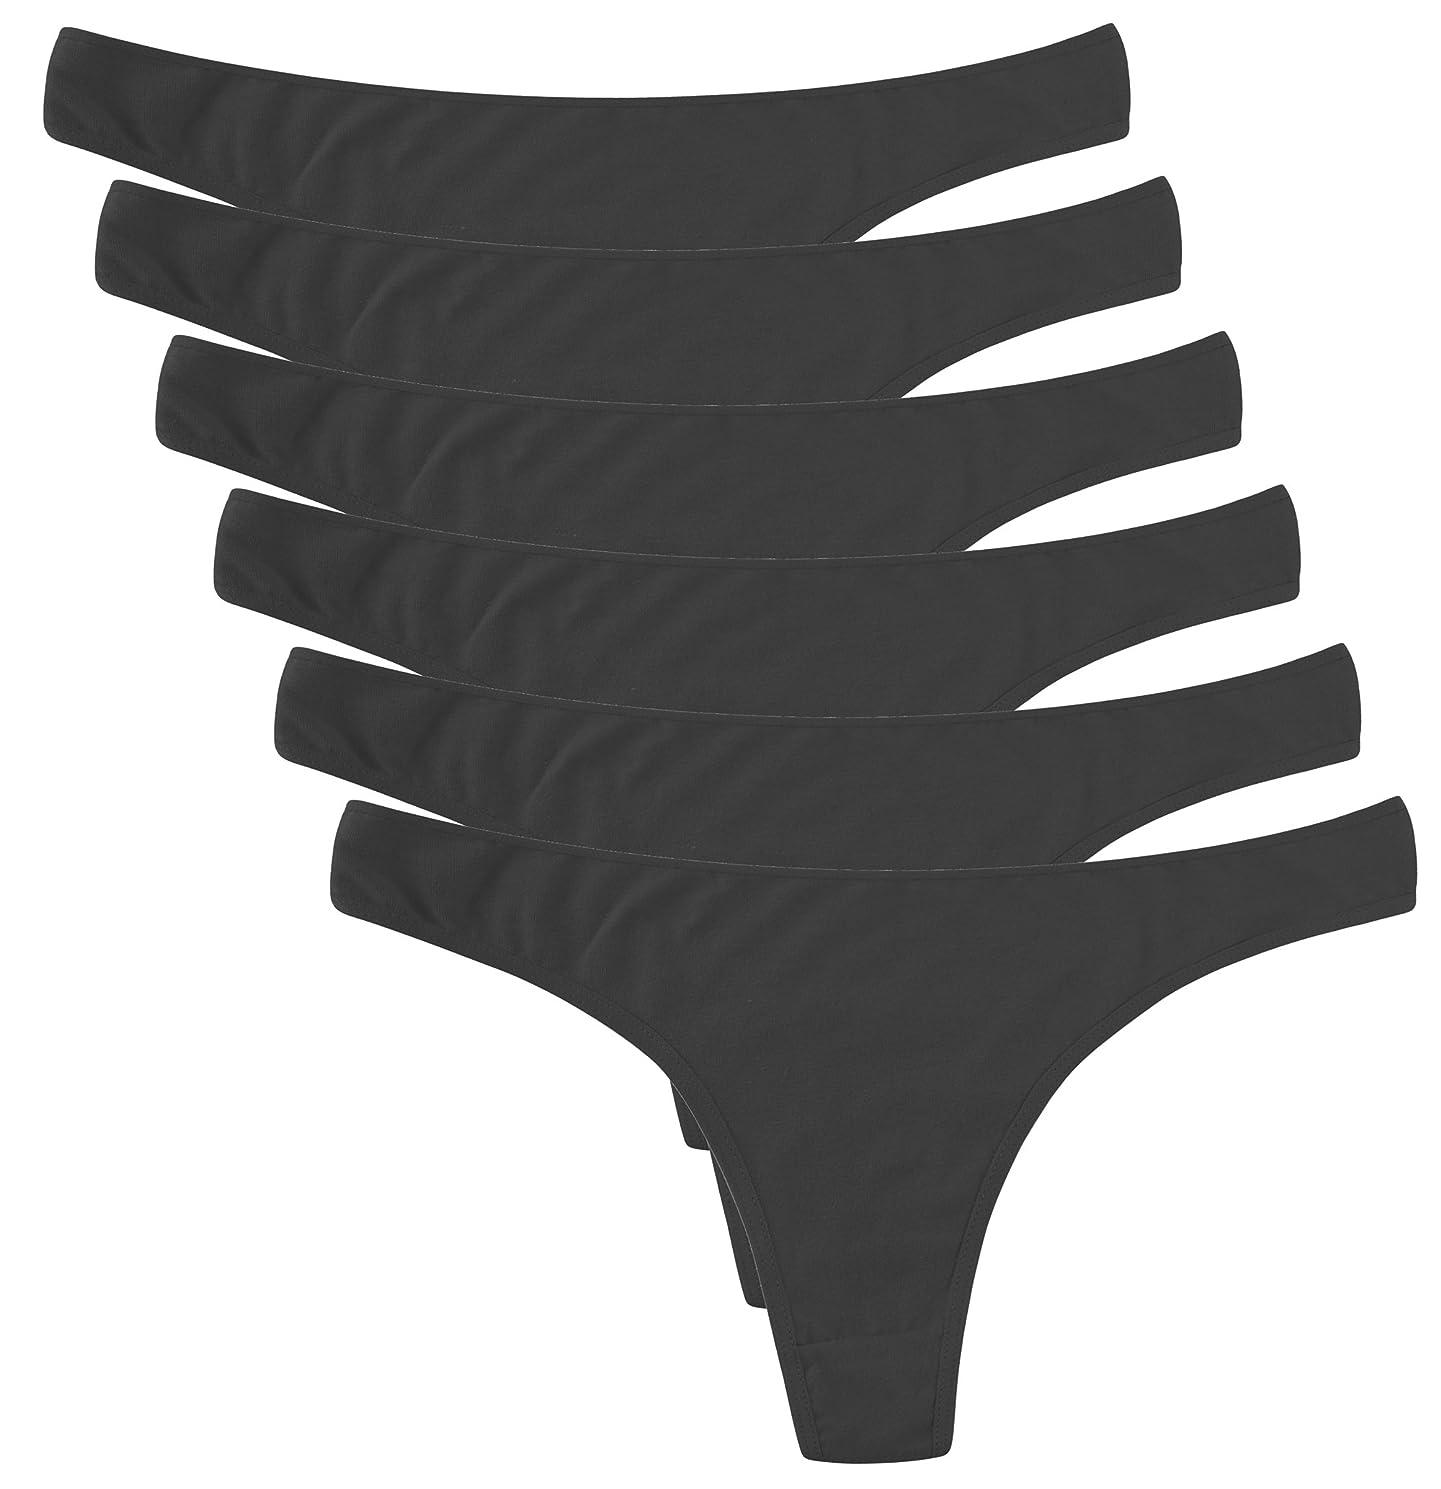 ELACUCOS 6 Pack Women's Thongs Cotton Breathable Panties Bikini Underwear